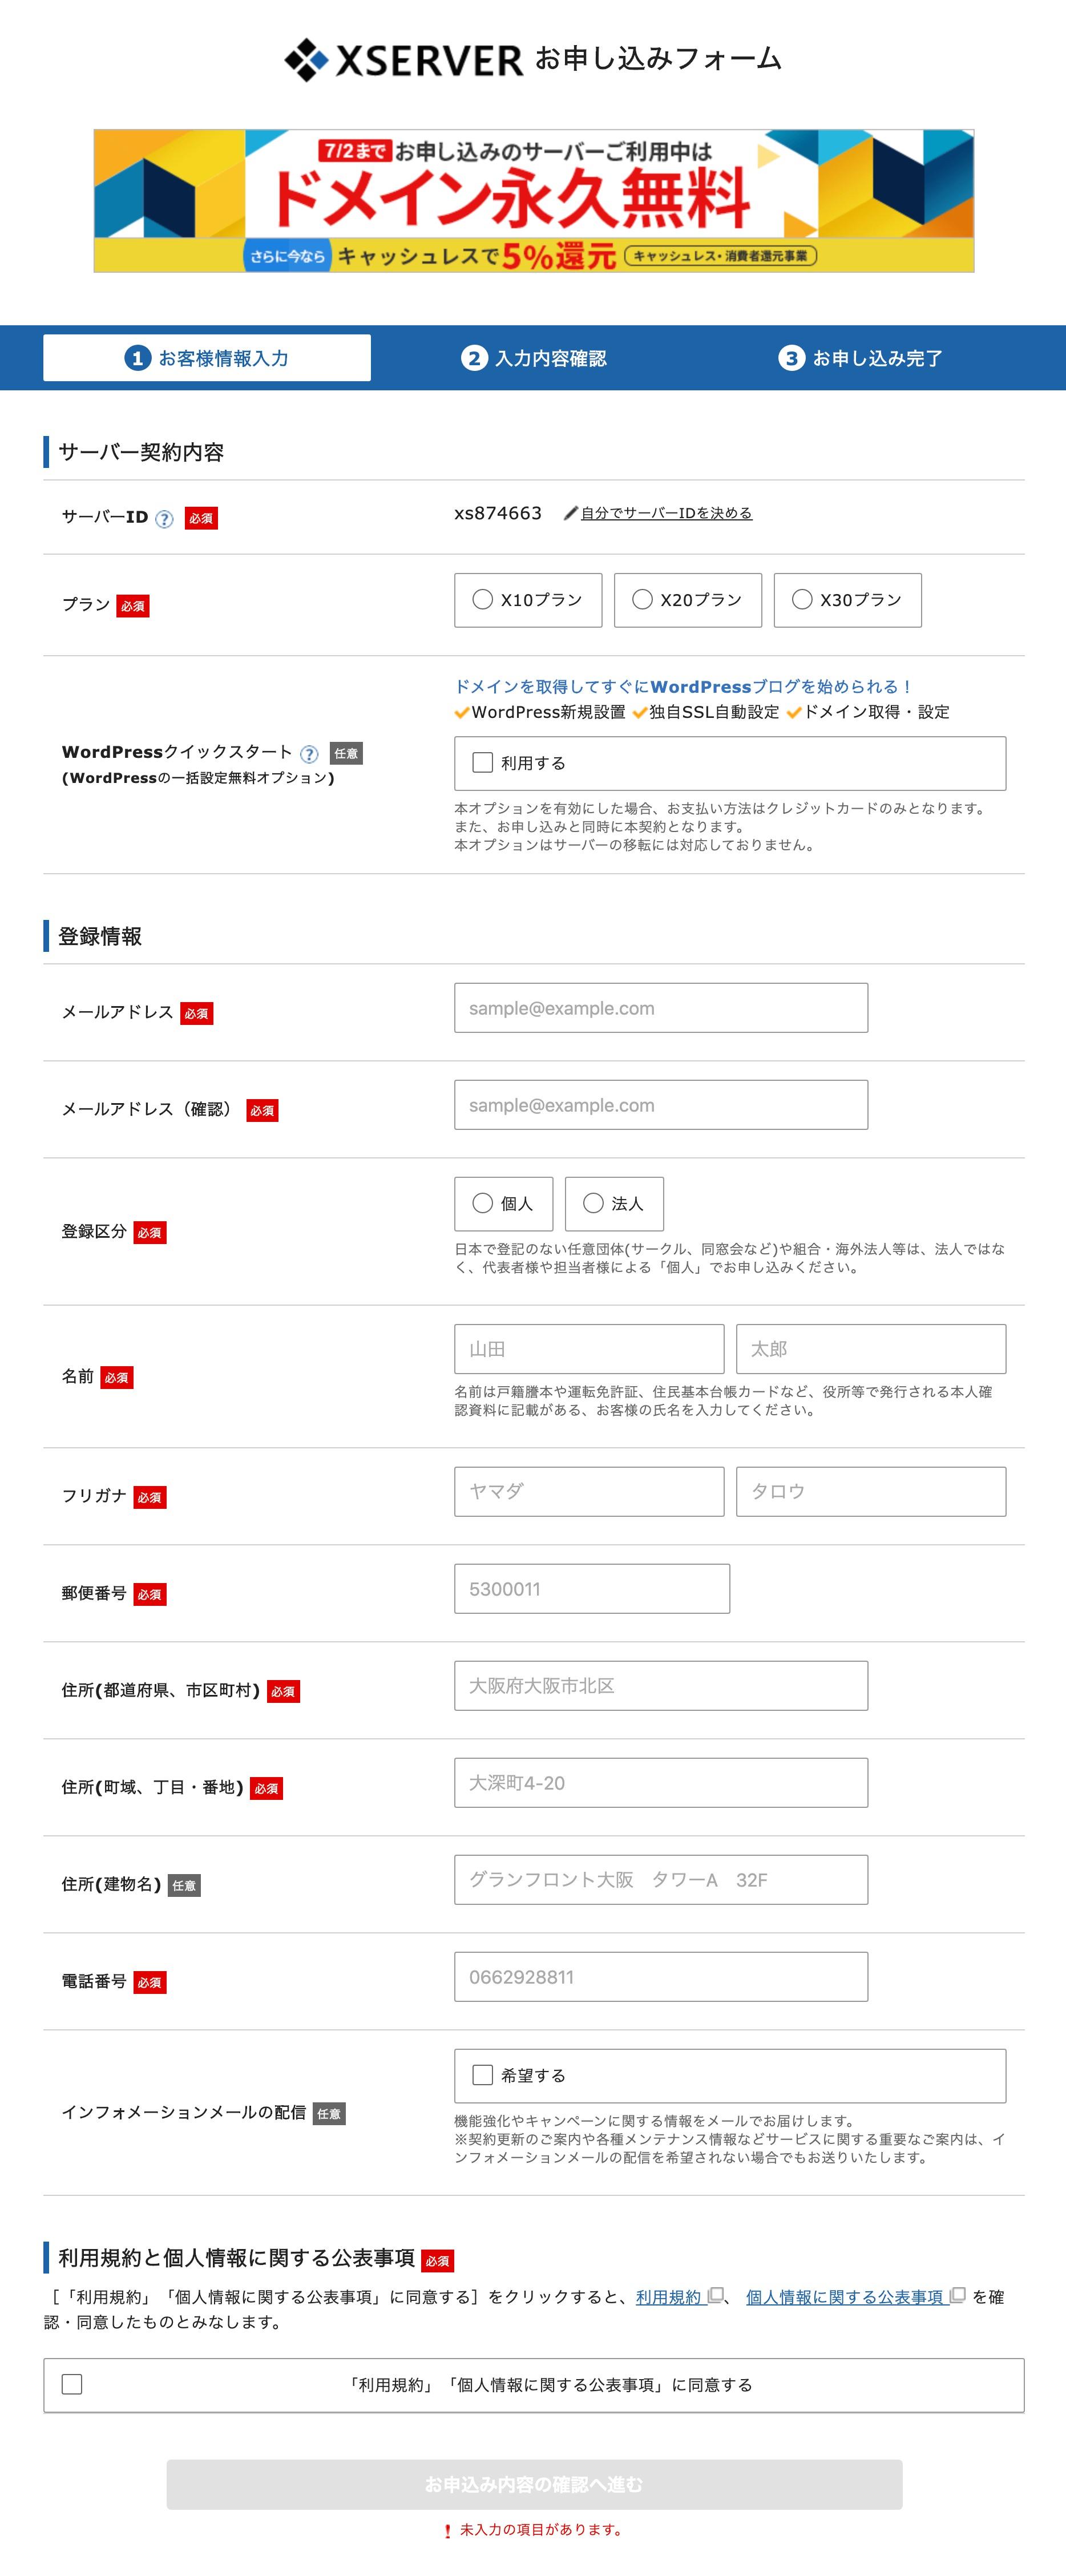 FireShot Capture 009 – お申し込み内容入力画面|エックスサーバー – secure.xserver.ne.jp